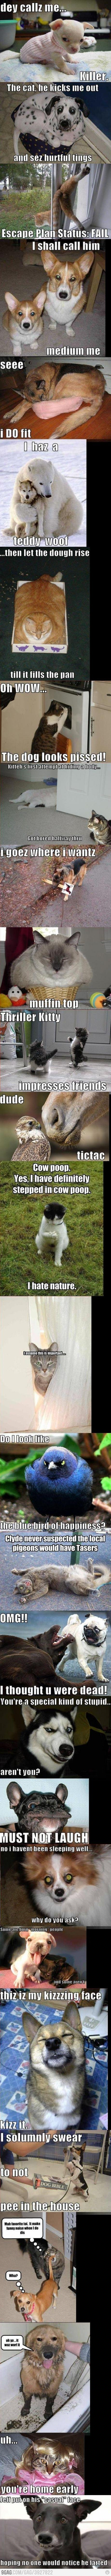 Too many cute animals!